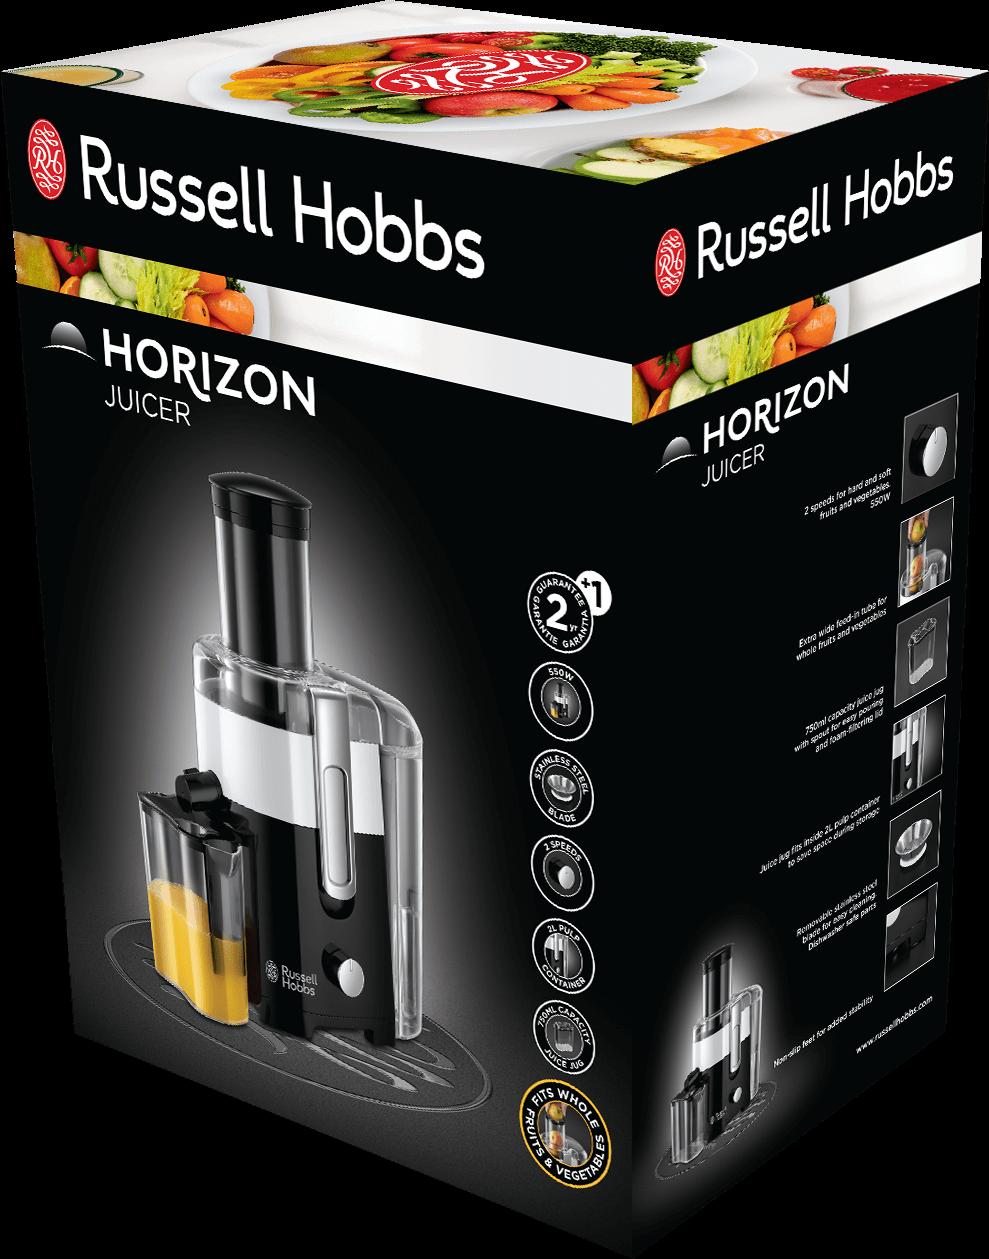 Sokowirówka Russell Hobbs Horizon 24741 56